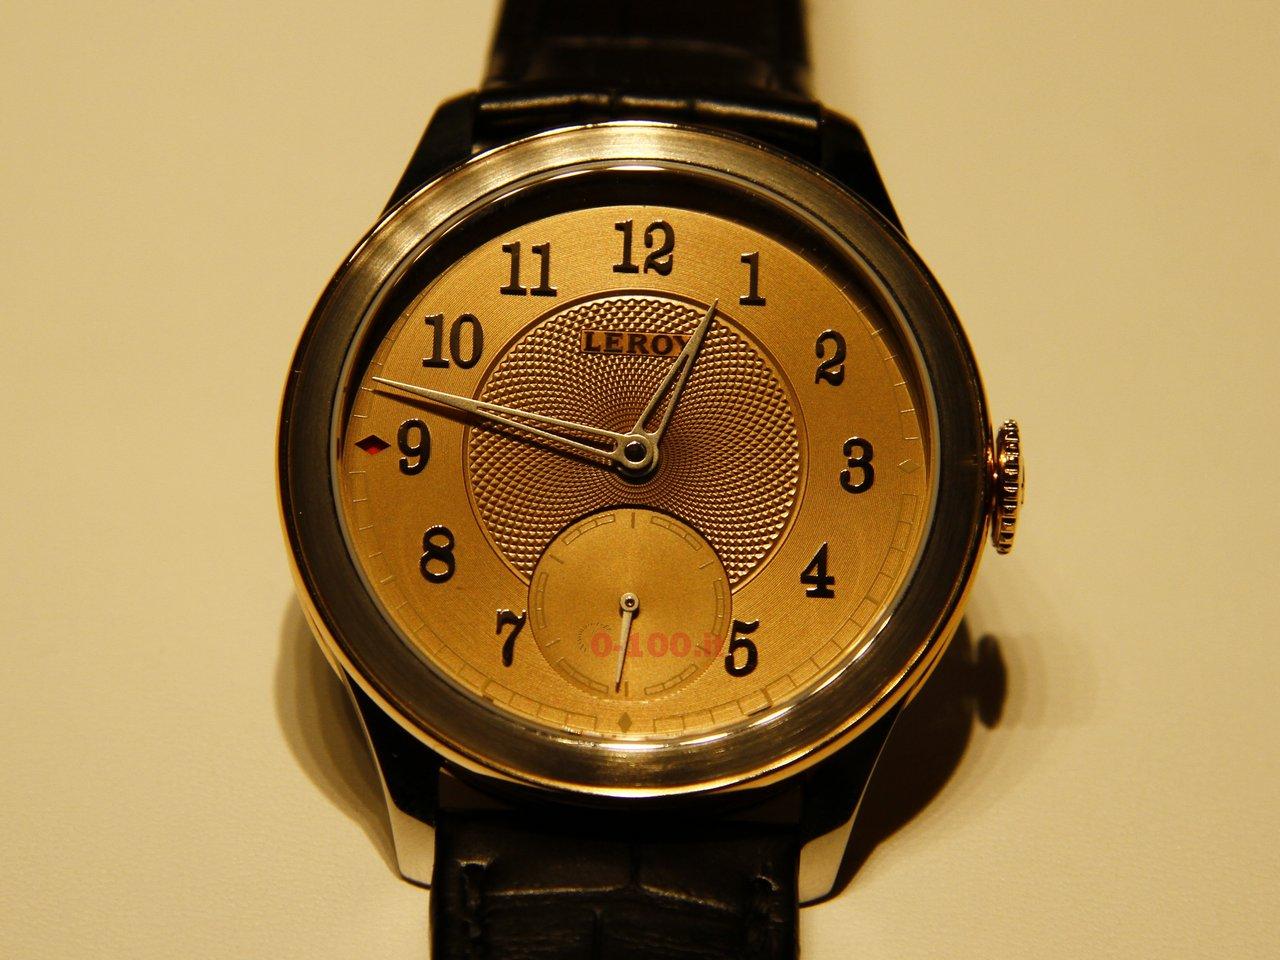 baselworld-2015_leroy-chronometer-l200-0-100-11